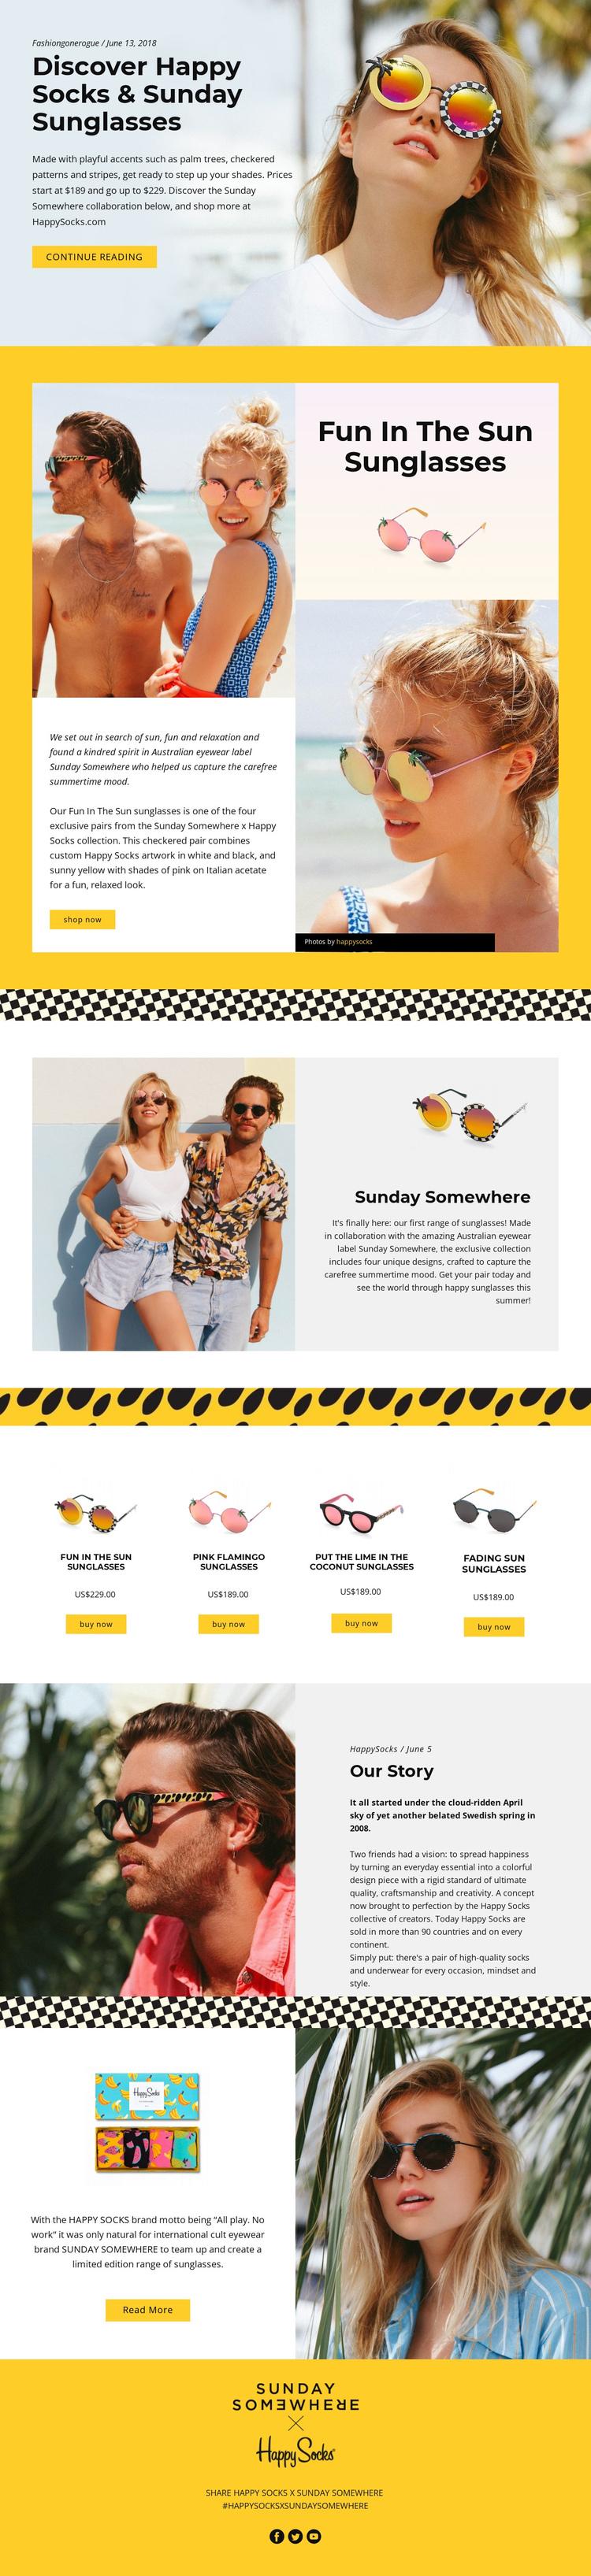 Fun Sunglasses Website Builder Software